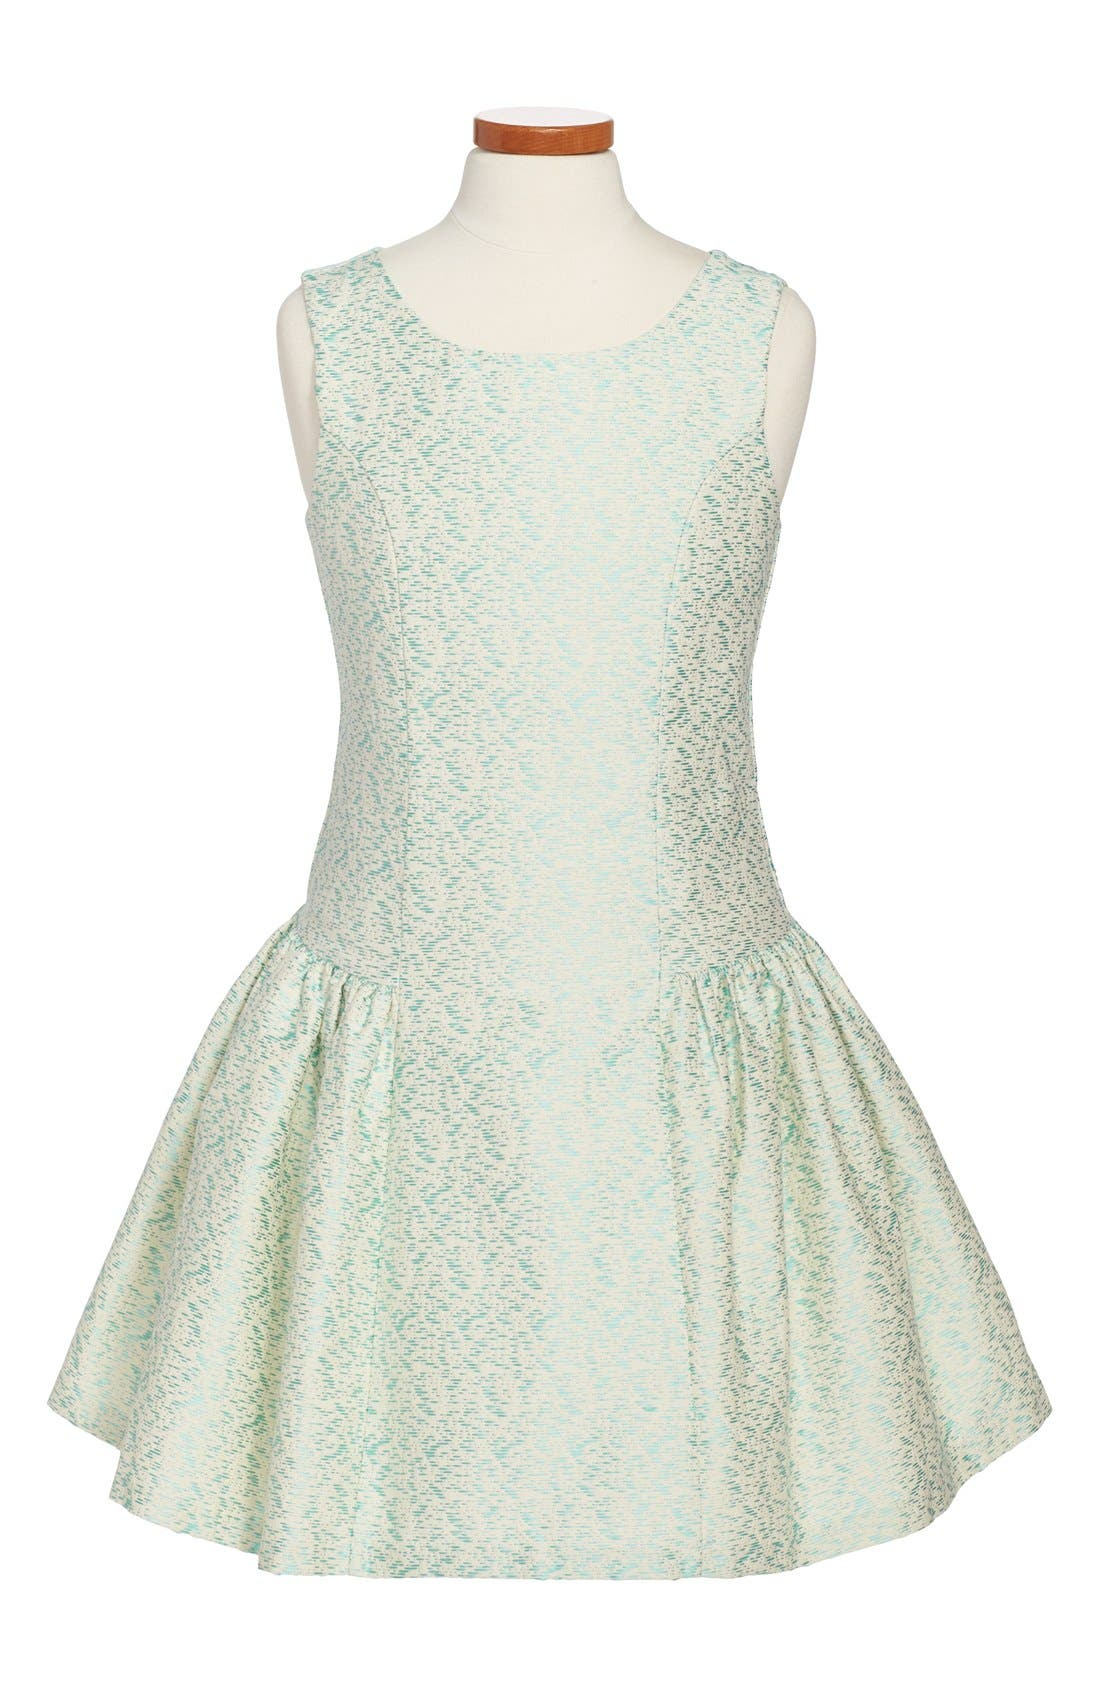 Main Image - Iris & Ivy Sleeveless Brocade Dress (Big Girls)